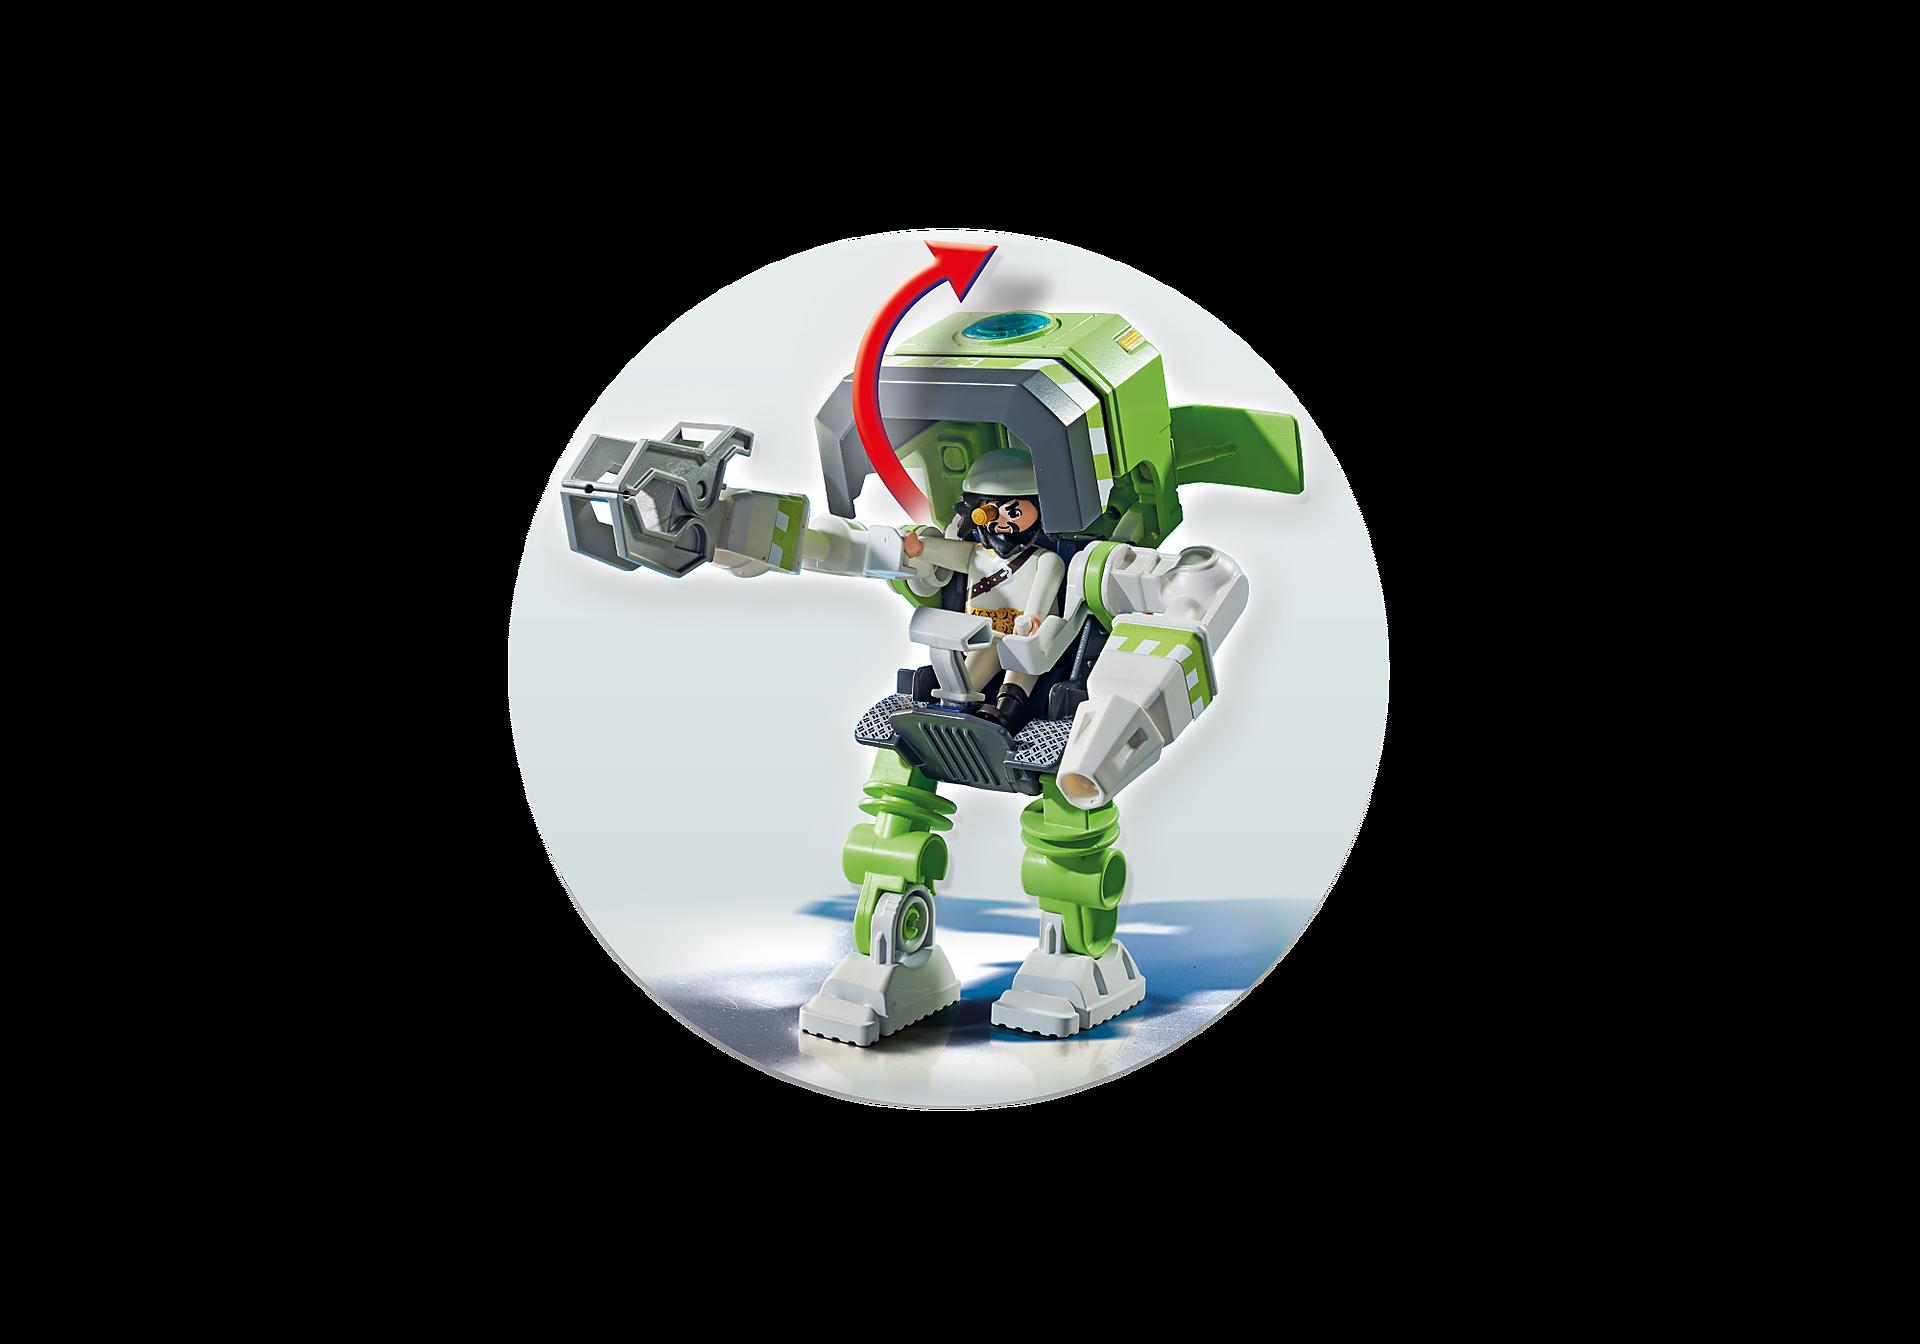 http://media.playmobil.com/i/playmobil/6693_product_extra1/Cleano Robot